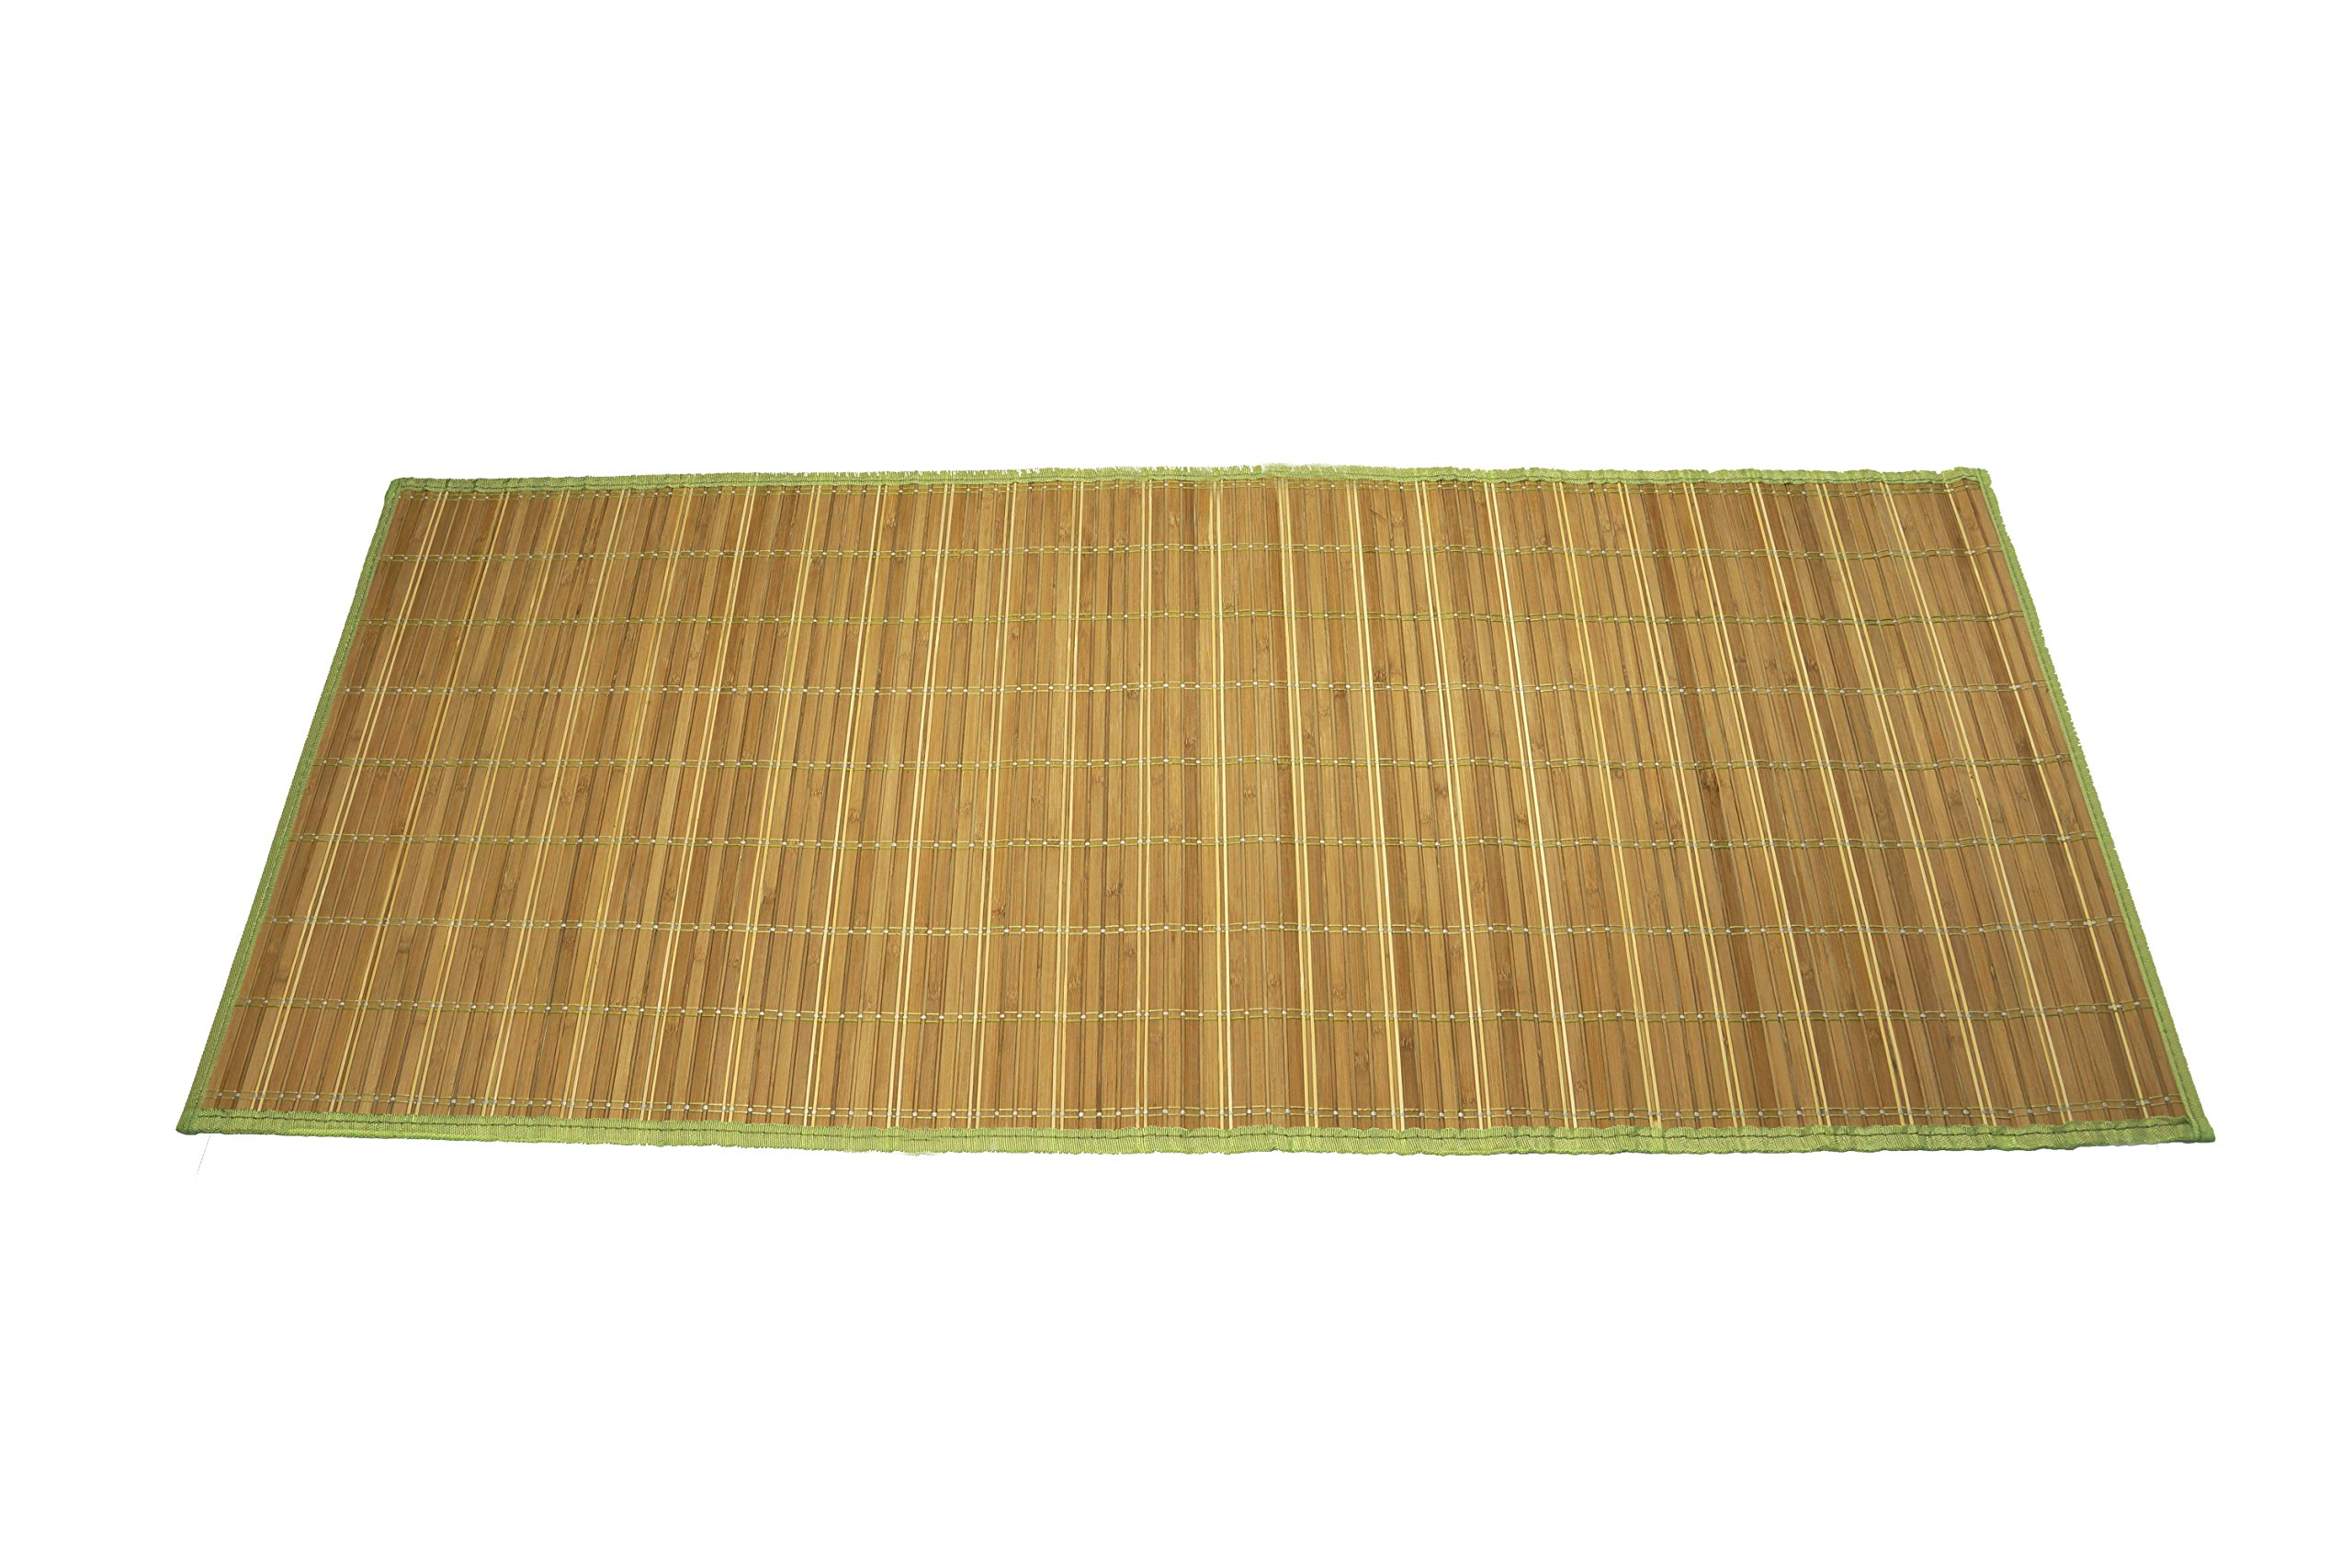 Emerald Wholesale Bamboo Mat Runner with Foam Non-Skid Backing, 24 x 60, Green